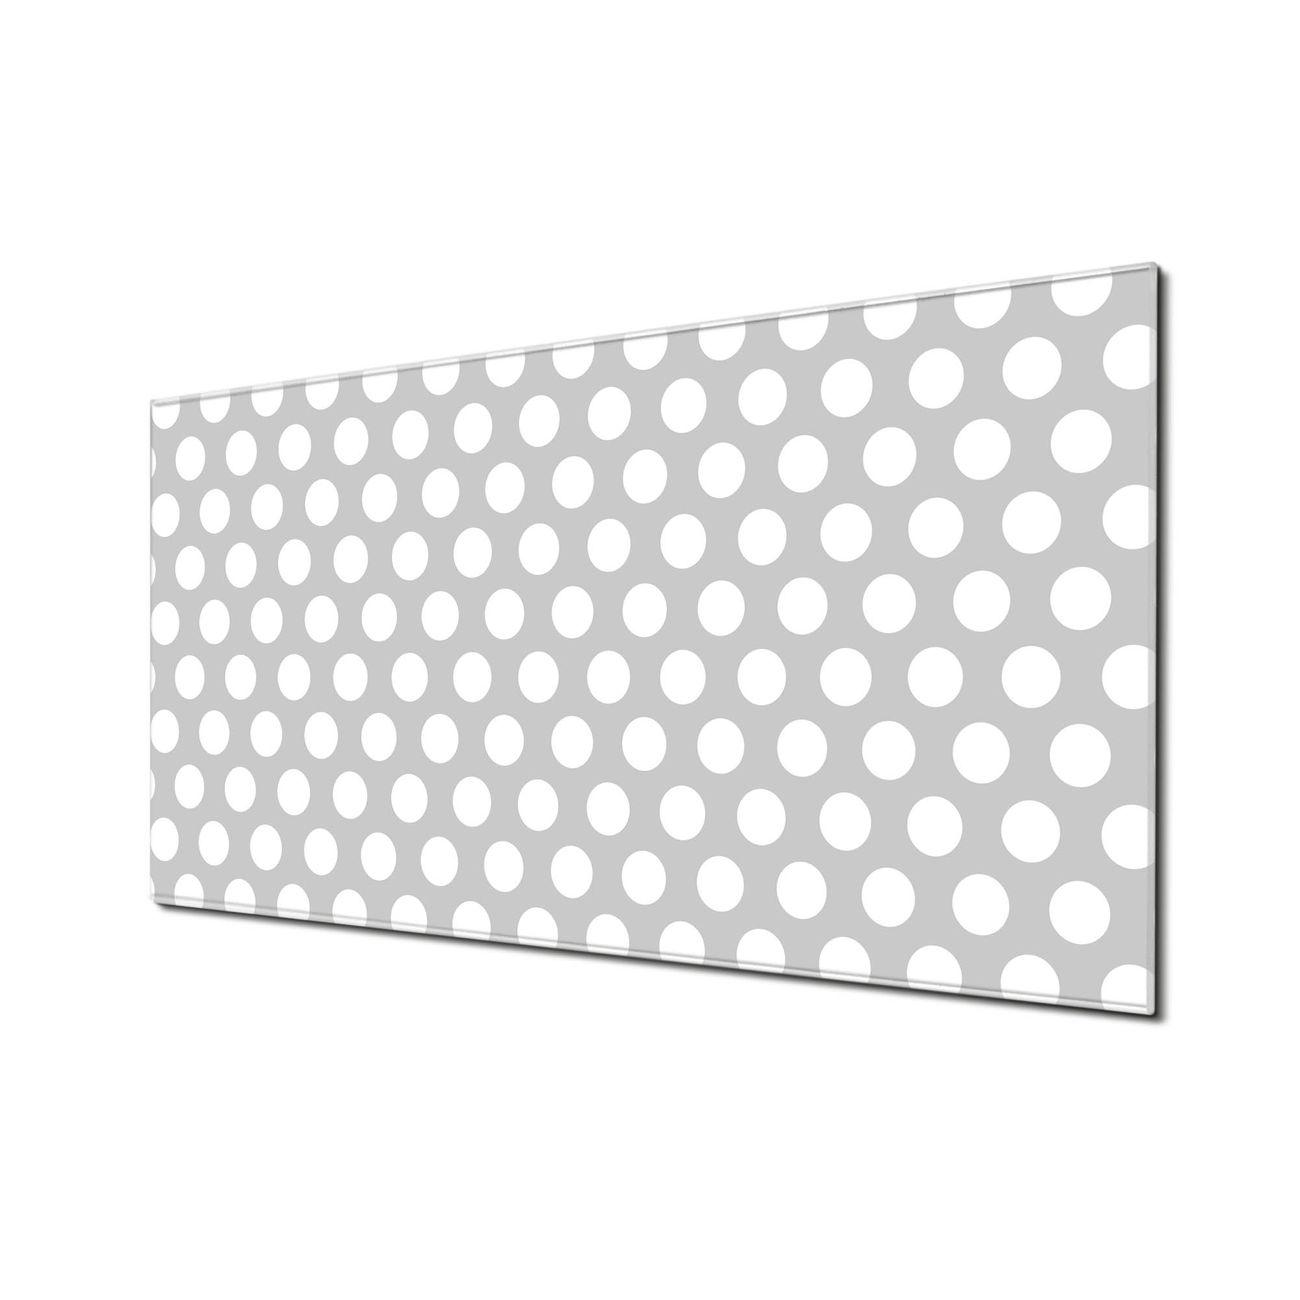 Küchenrückwand Glas Motiv Punkte Grau